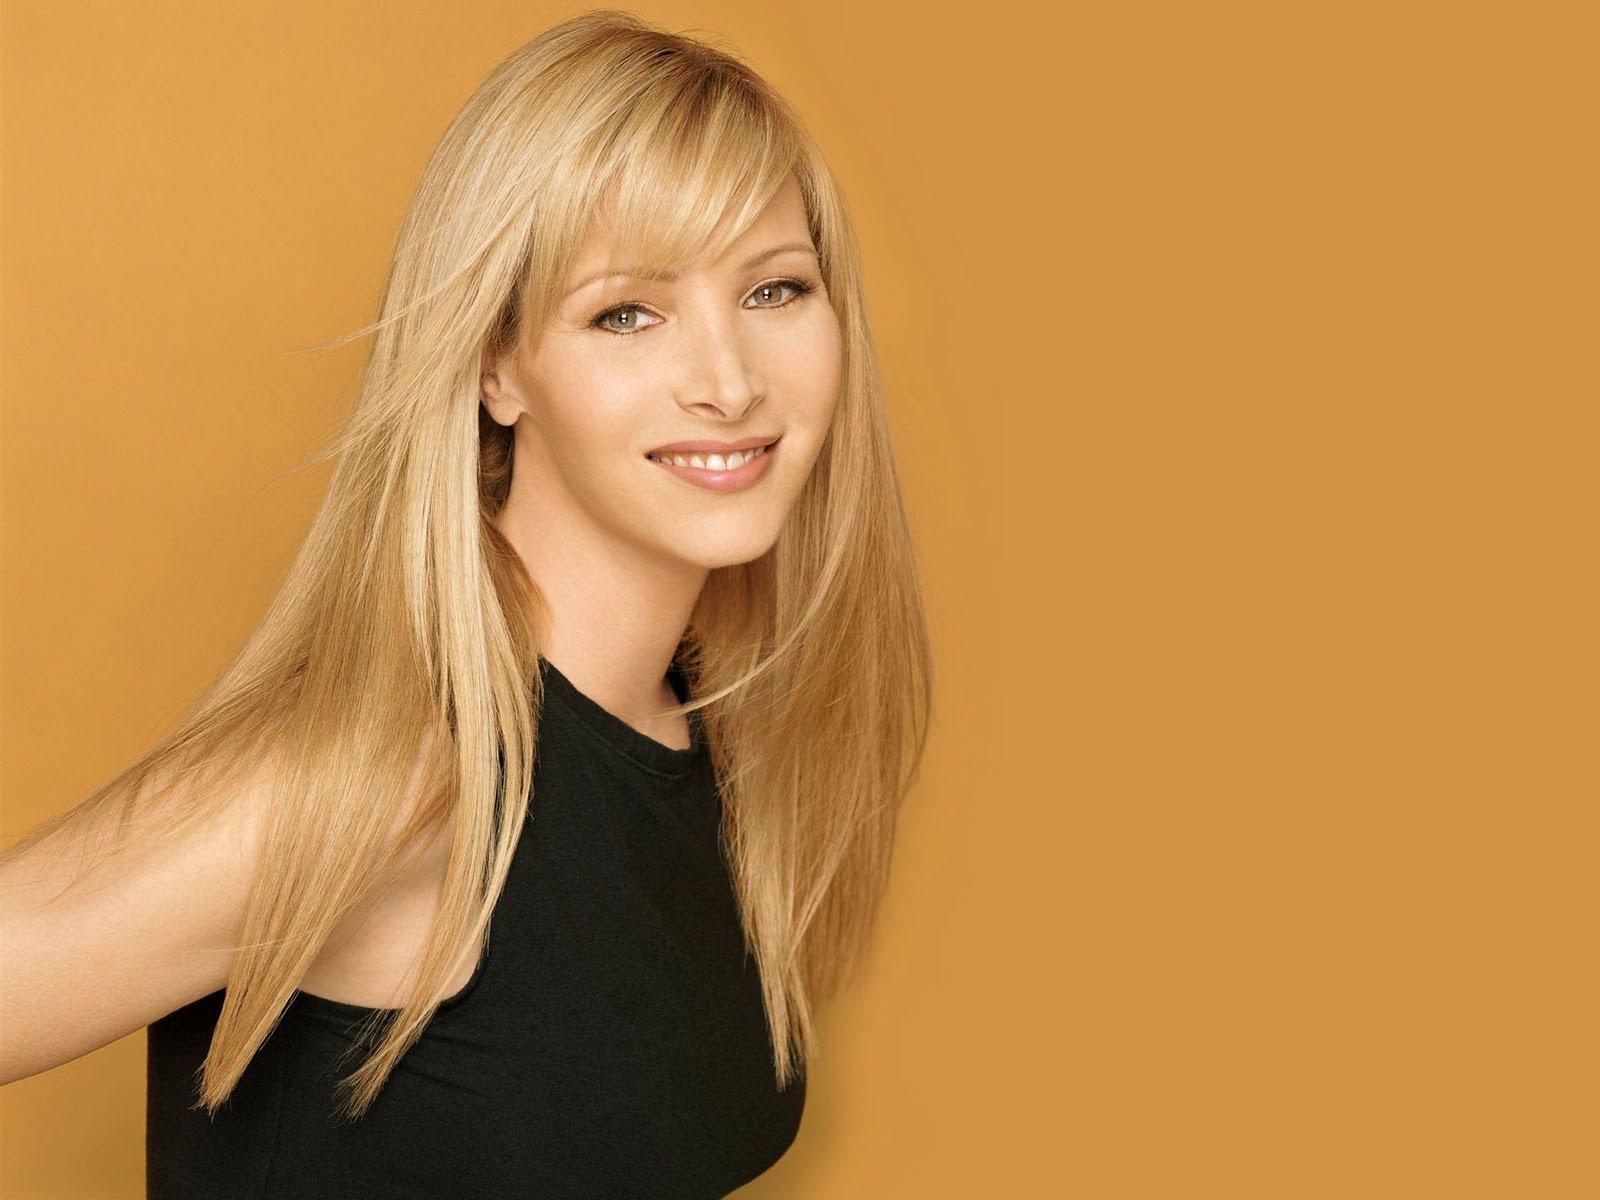 Lisa Kudrow Net Worth